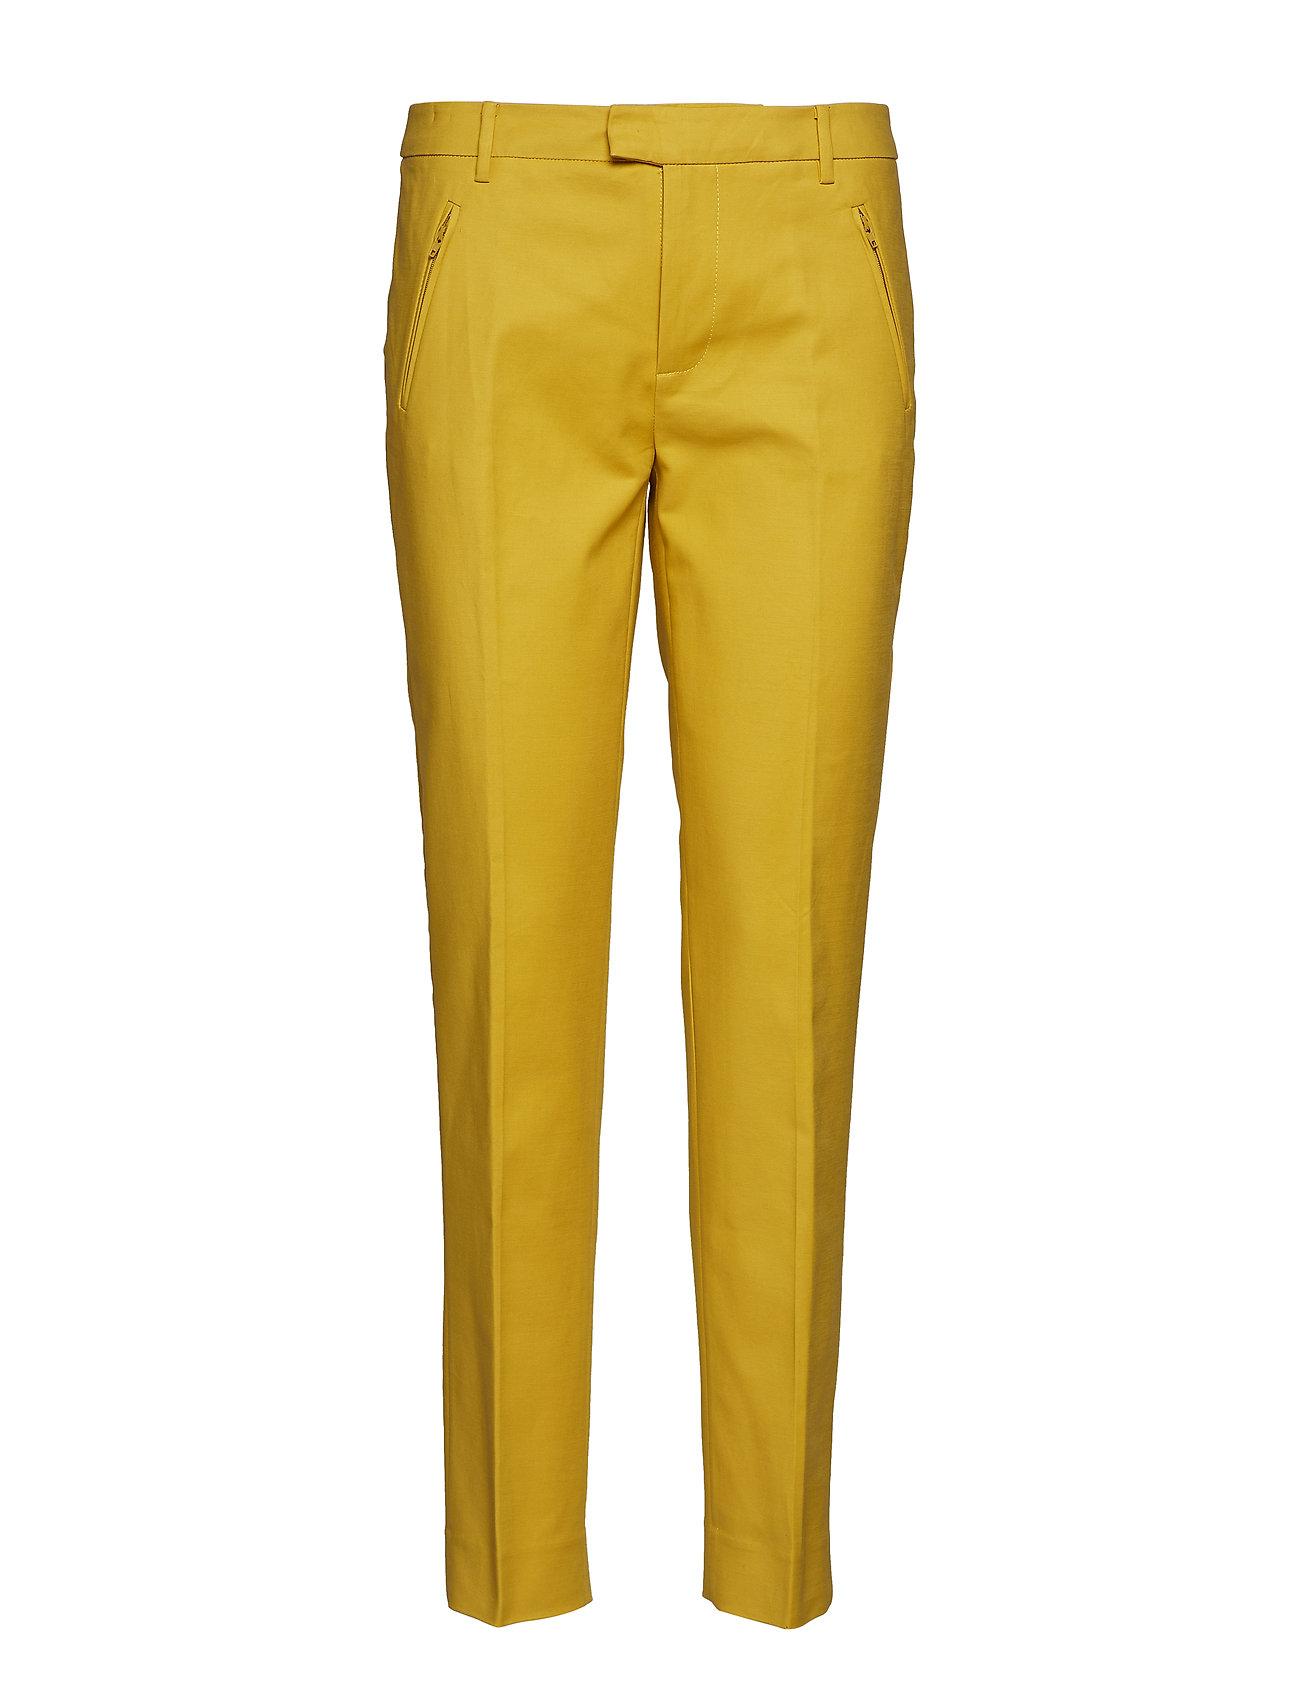 Image of Trousers Bukser Med Lige Ben Gul Noa Noa (3122437511)